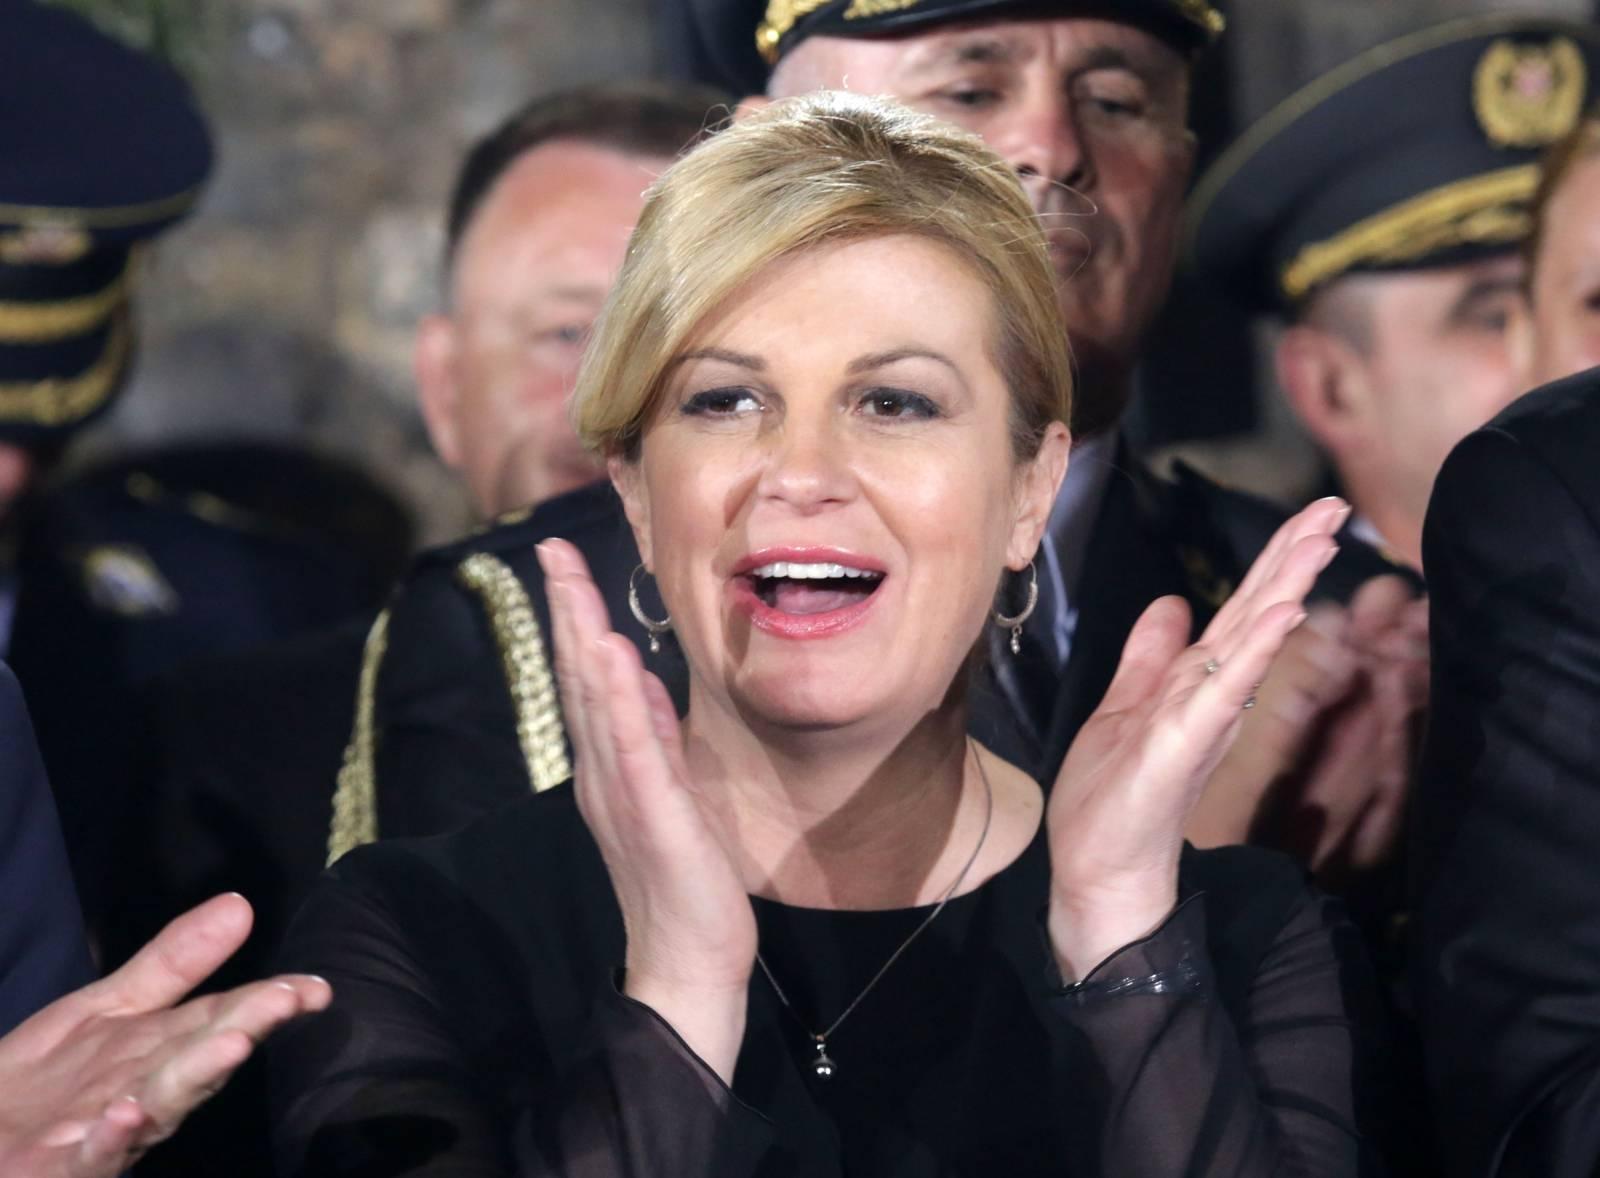 Knin: Predsjednica zapjevala na svečanom prijemu za ratne zapovjednike